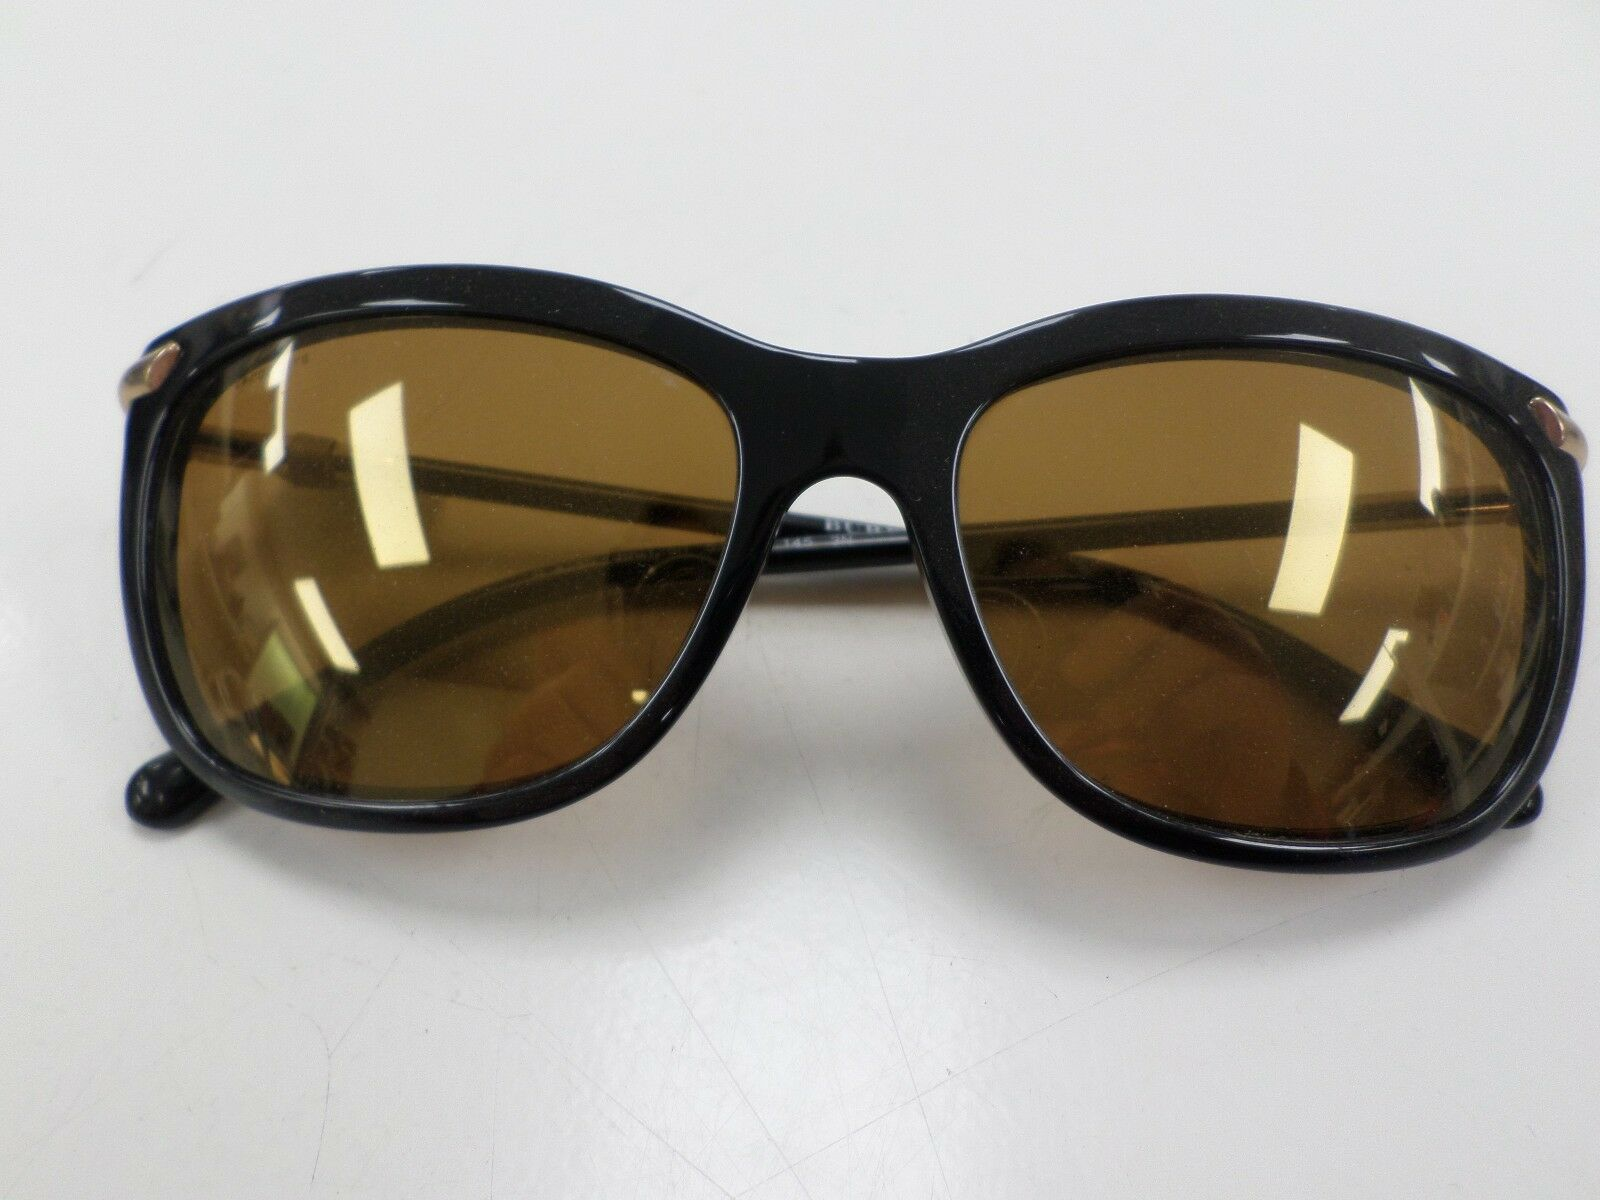 (I-1913) Burberry Sunglasses